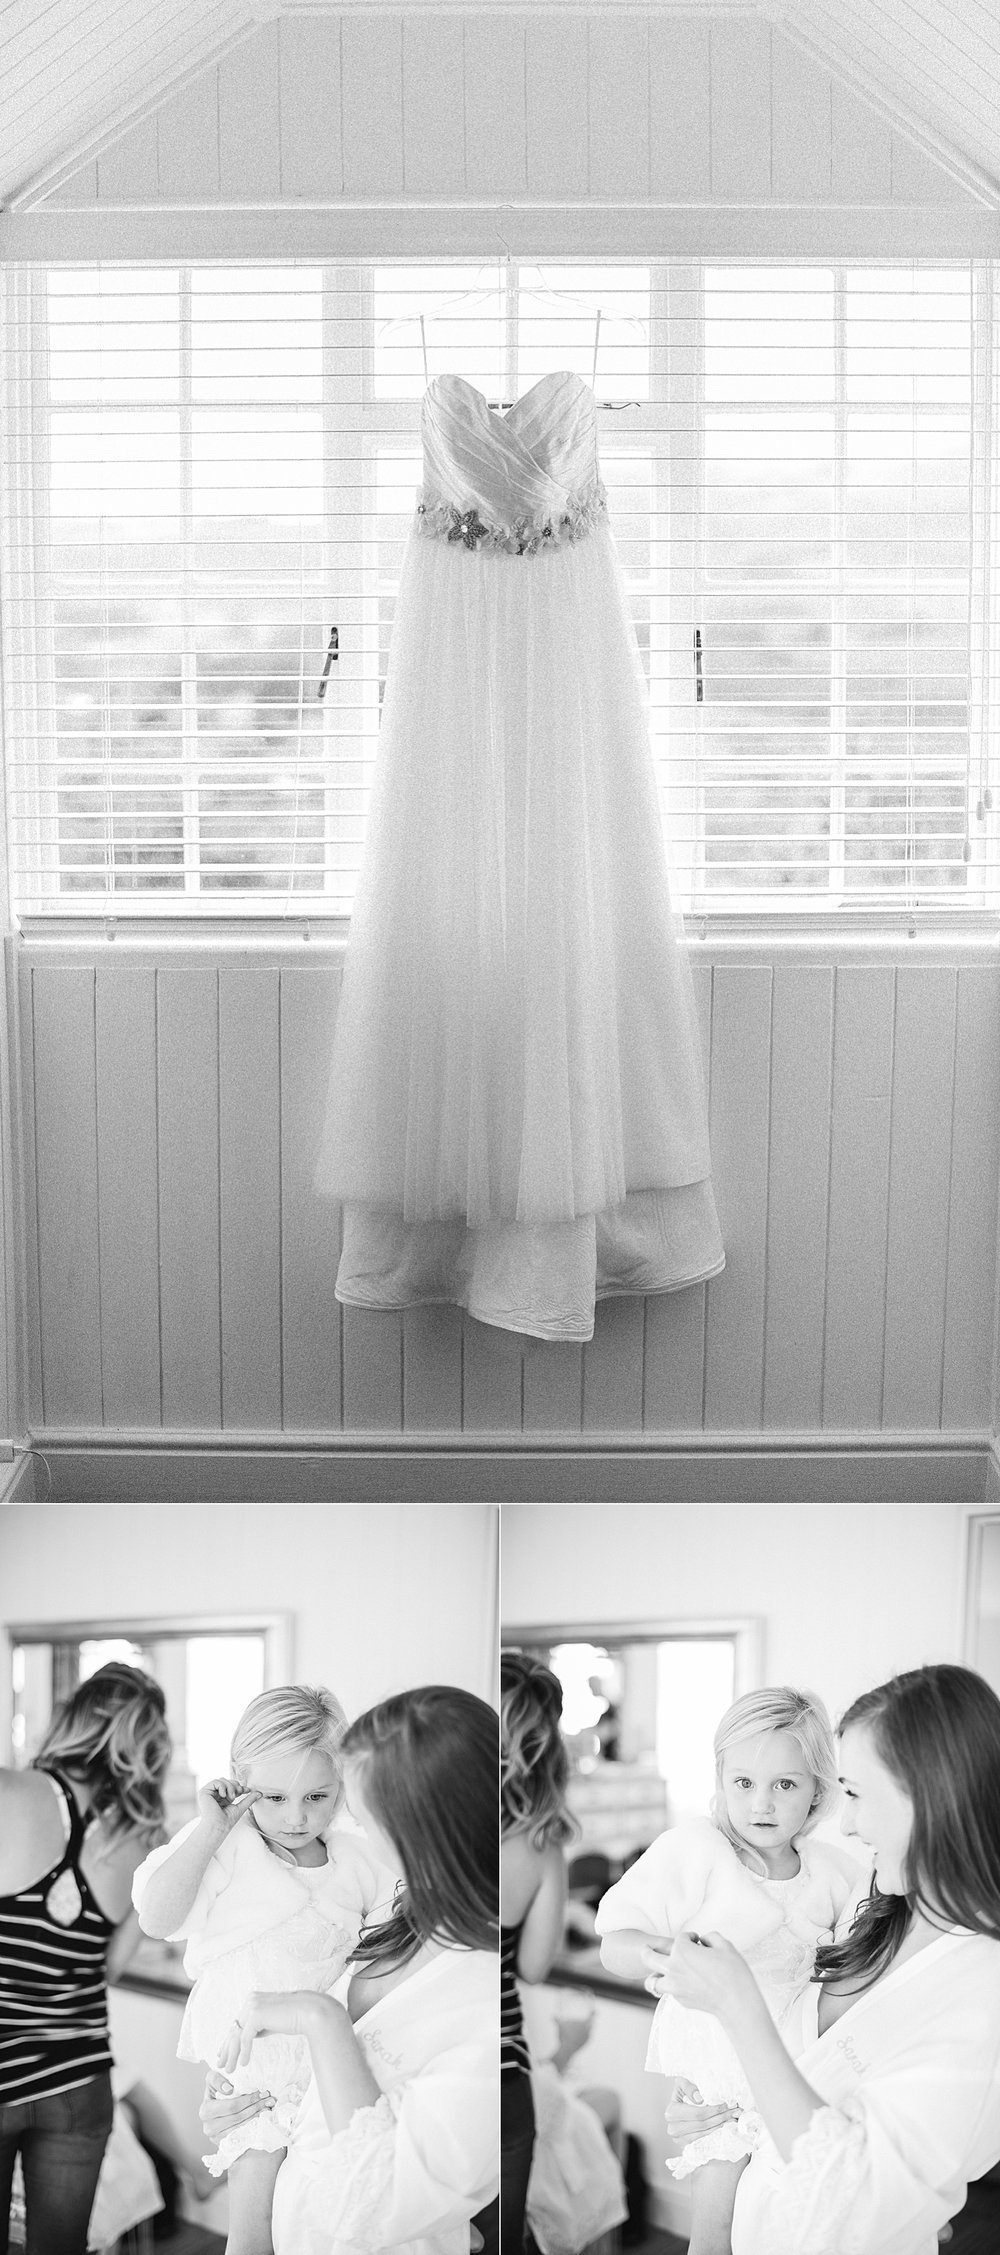 RyanParker_WeddingPhotographer_CapeTown_BonaDea_Hermanus_S&A_DSC_1129.jpg